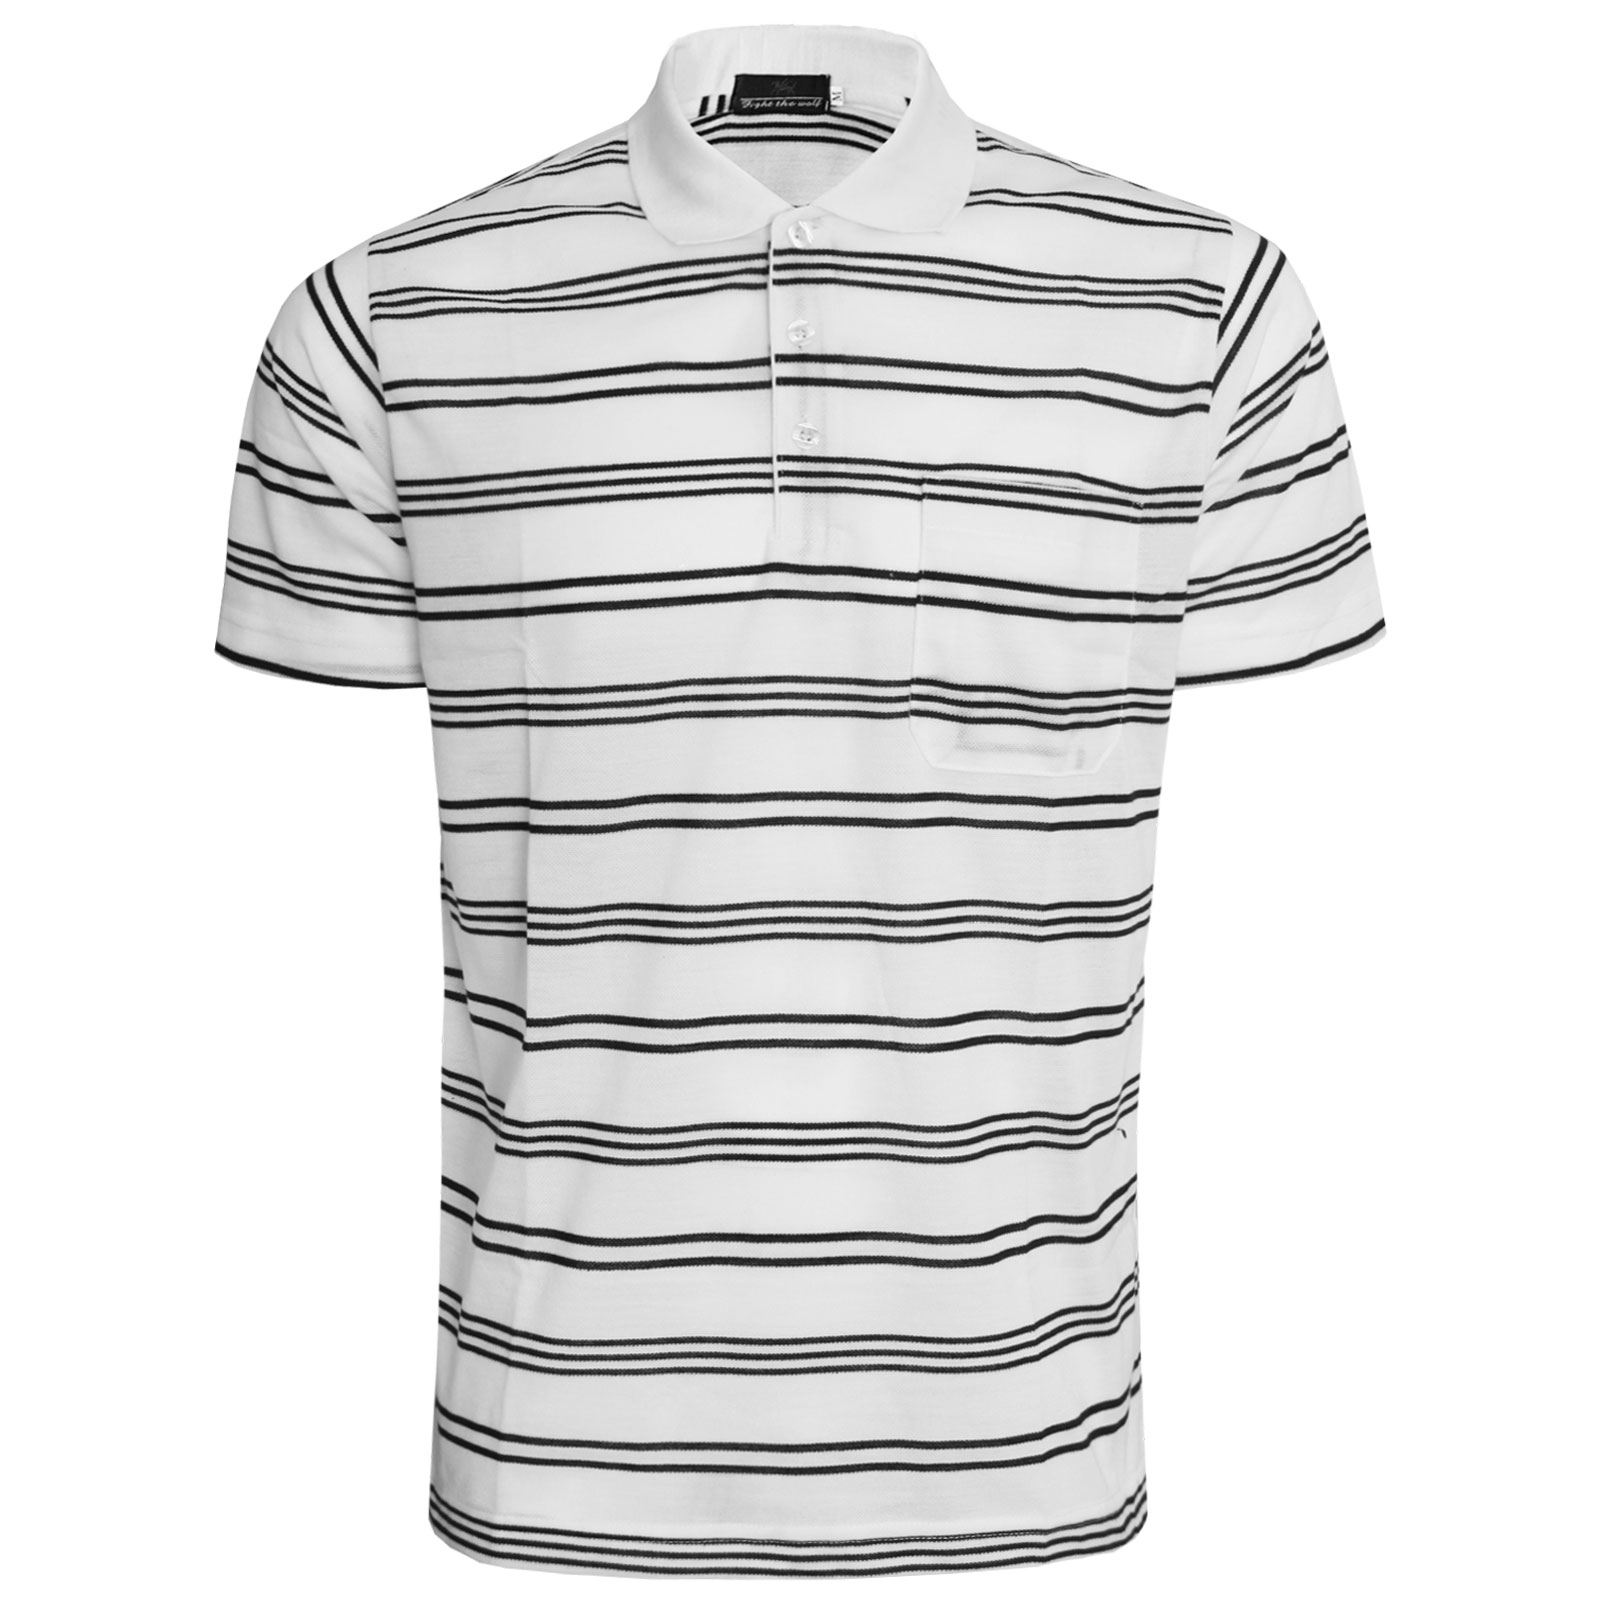 Plain black t shirt xxl - New Mens Plain Polo Shirt Short Sleeve Top